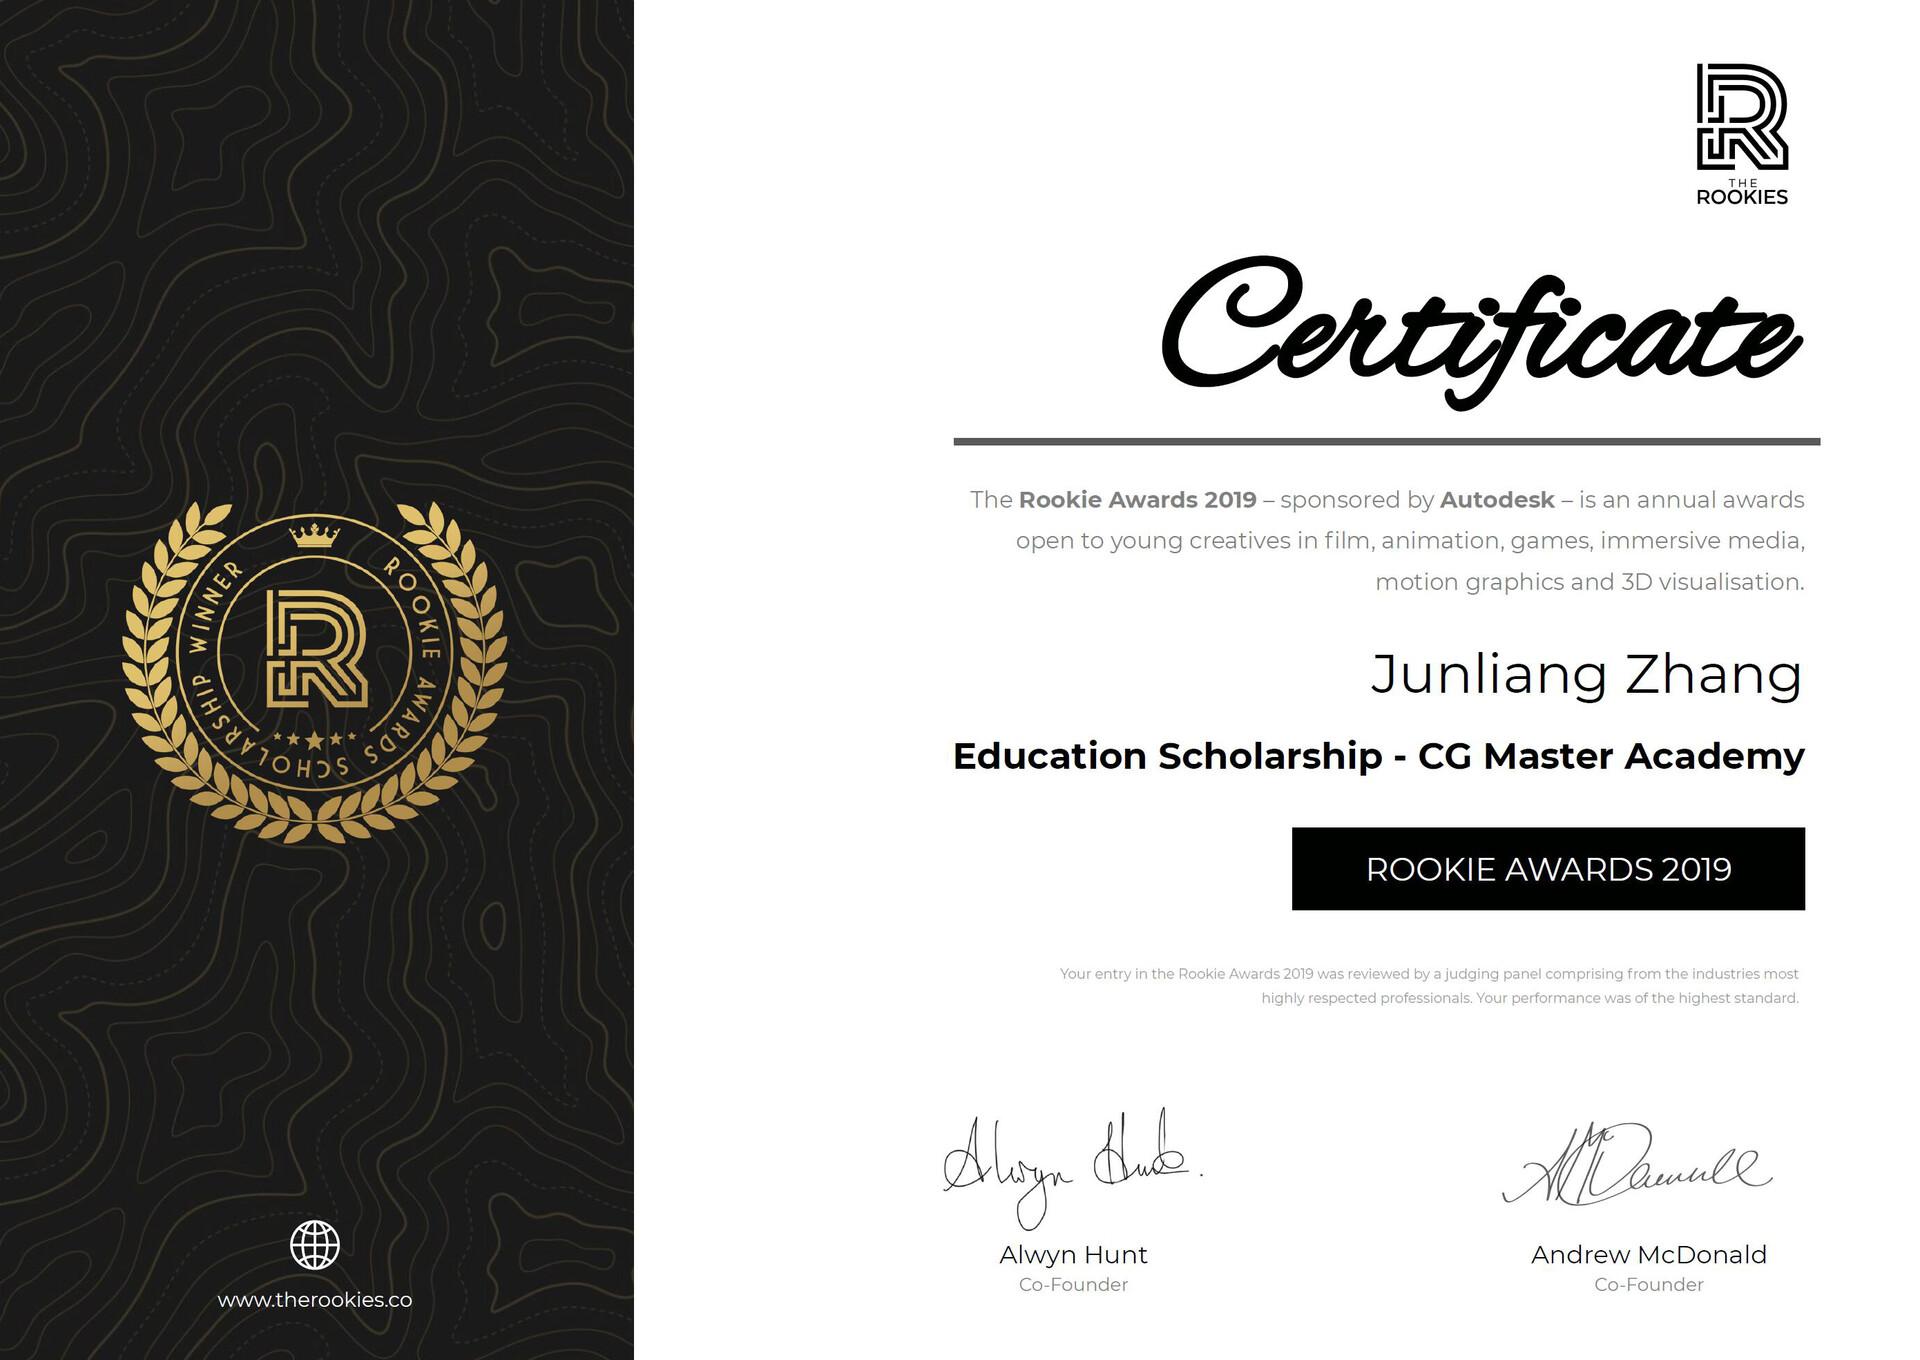 Junliang zhang education scholarship cg master academy winner